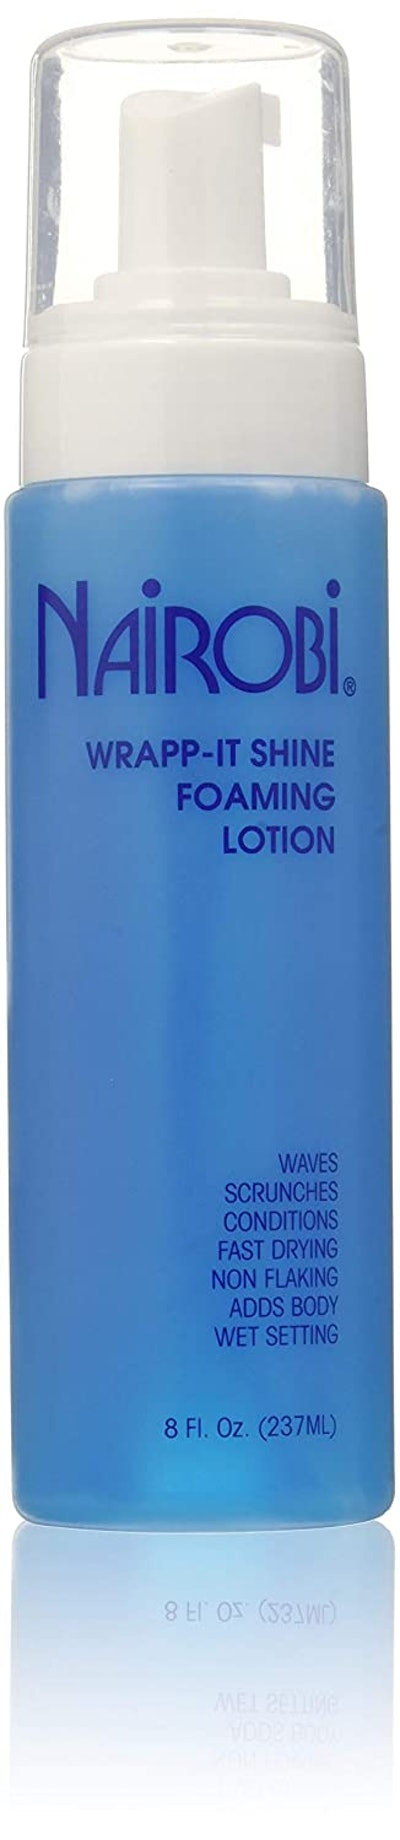 Nairobi Wrapp-It Shine Foaming Lotion